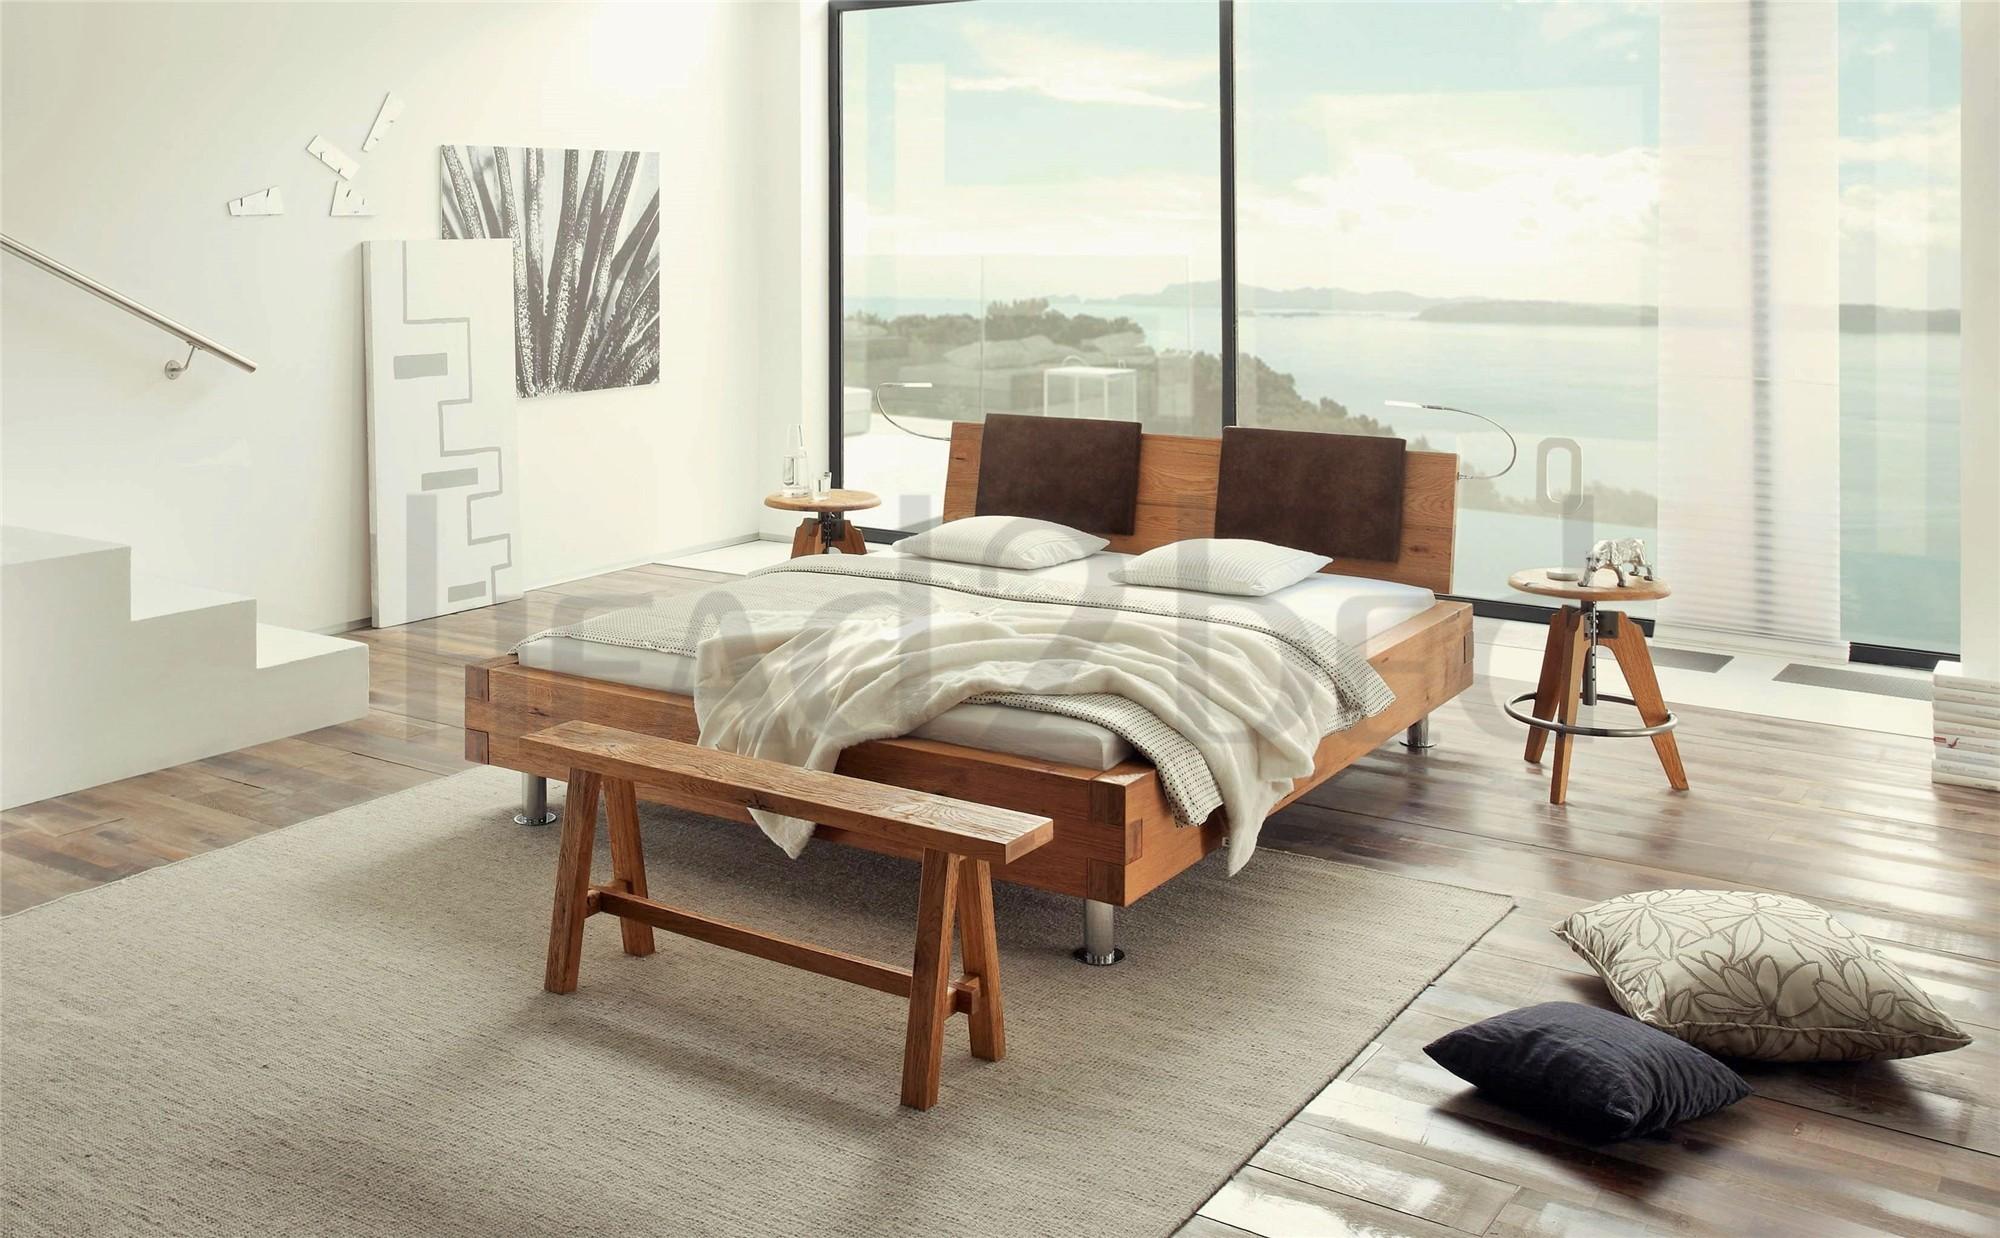 contemporary designer beds hasena pilatus grado sion. Black Bedroom Furniture Sets. Home Design Ideas